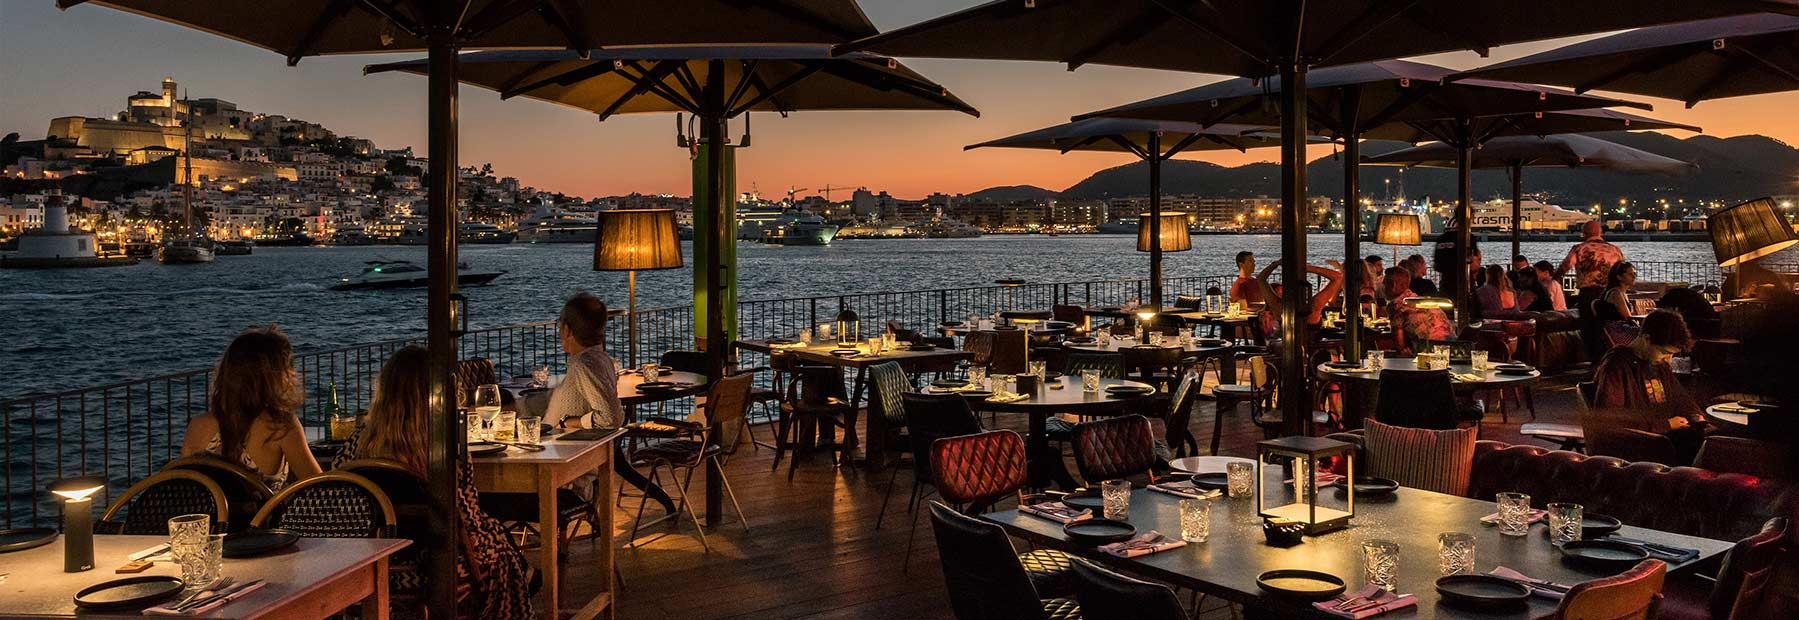 Interiorismo restaurante Ibiza.